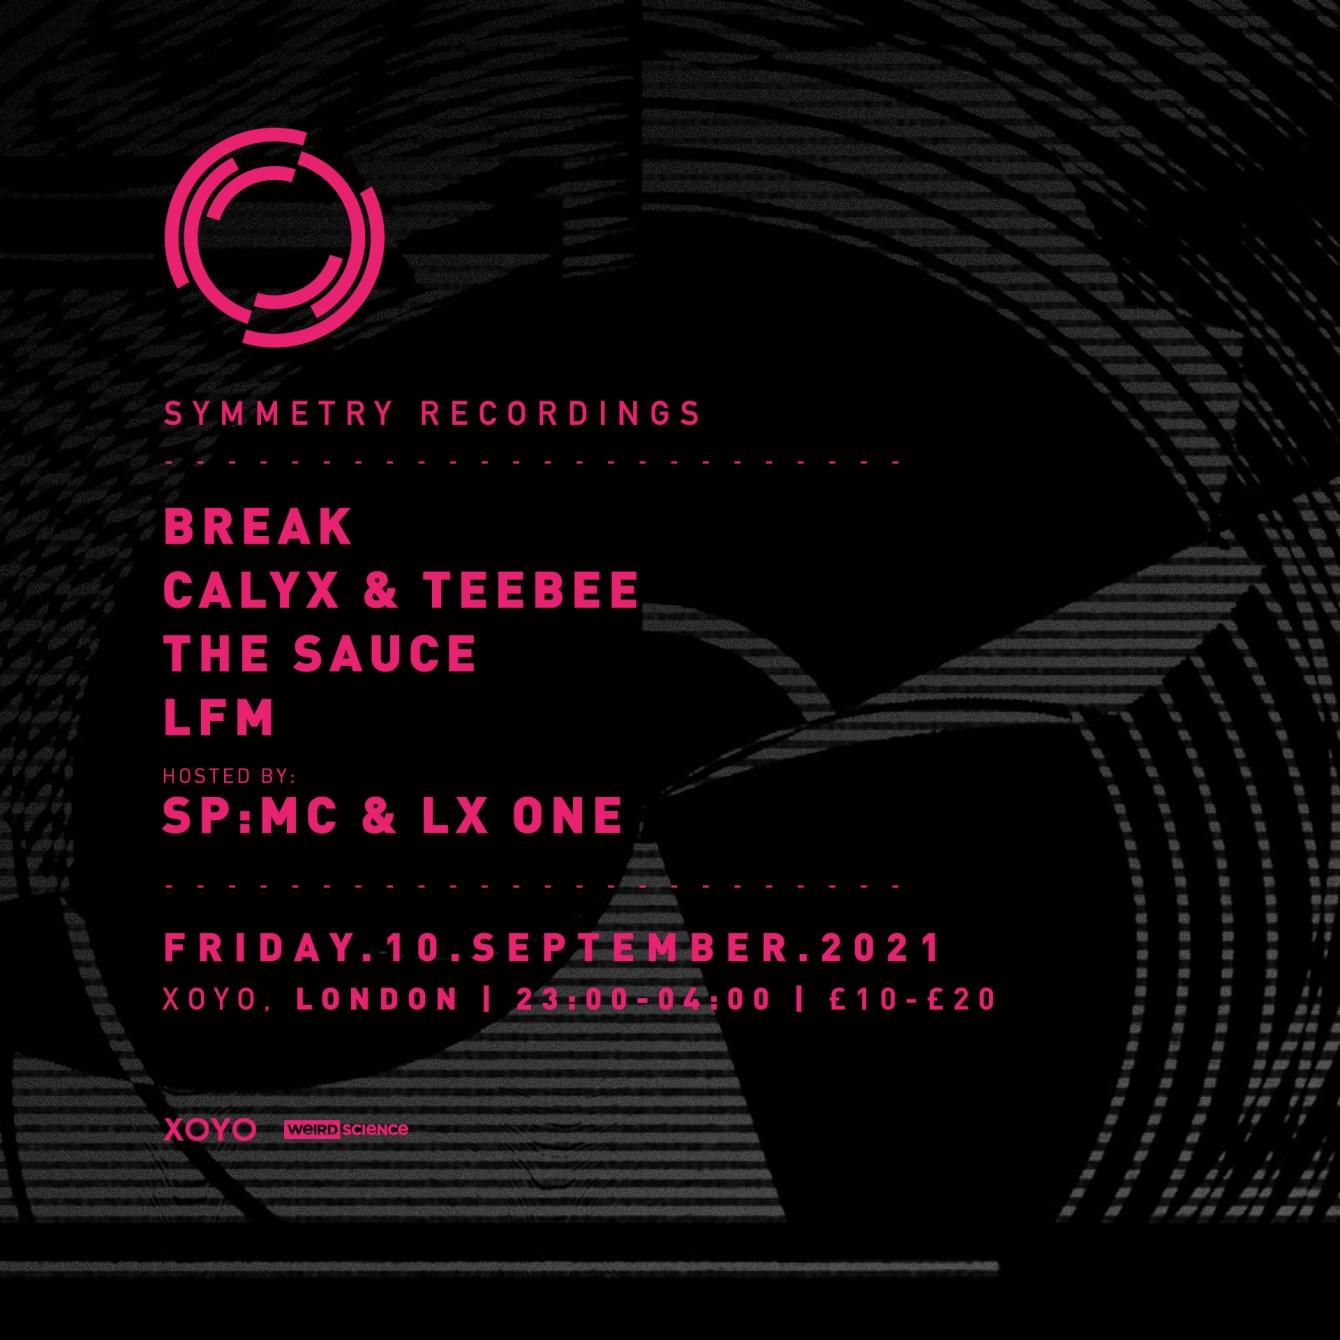 Symmetry Recordings: London with Break, Calyx & Teebee, The Sauce, SP:MC, LX One - Flyer front